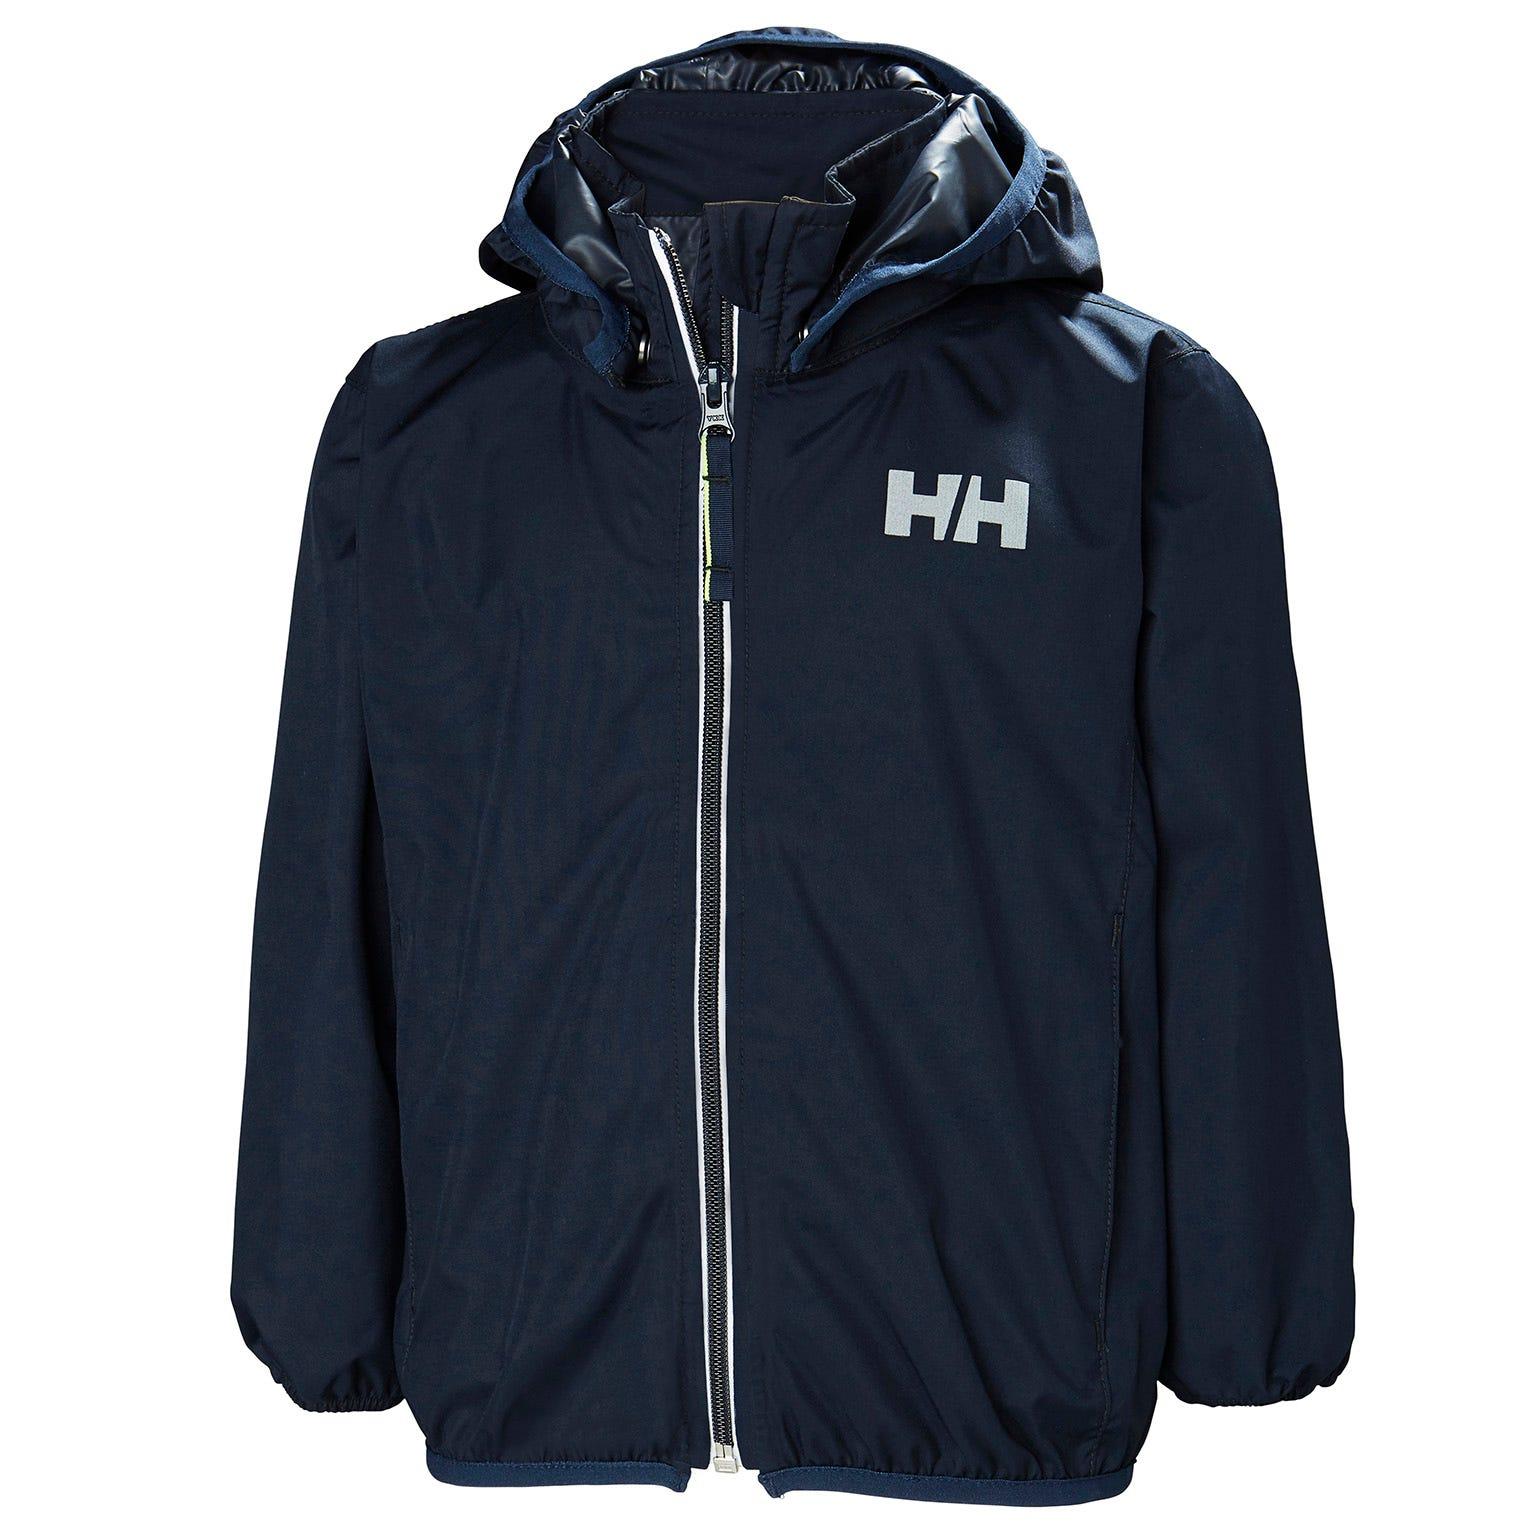 Helly Hansen Kids Helium Packable Jacket Parka Navy 104/4